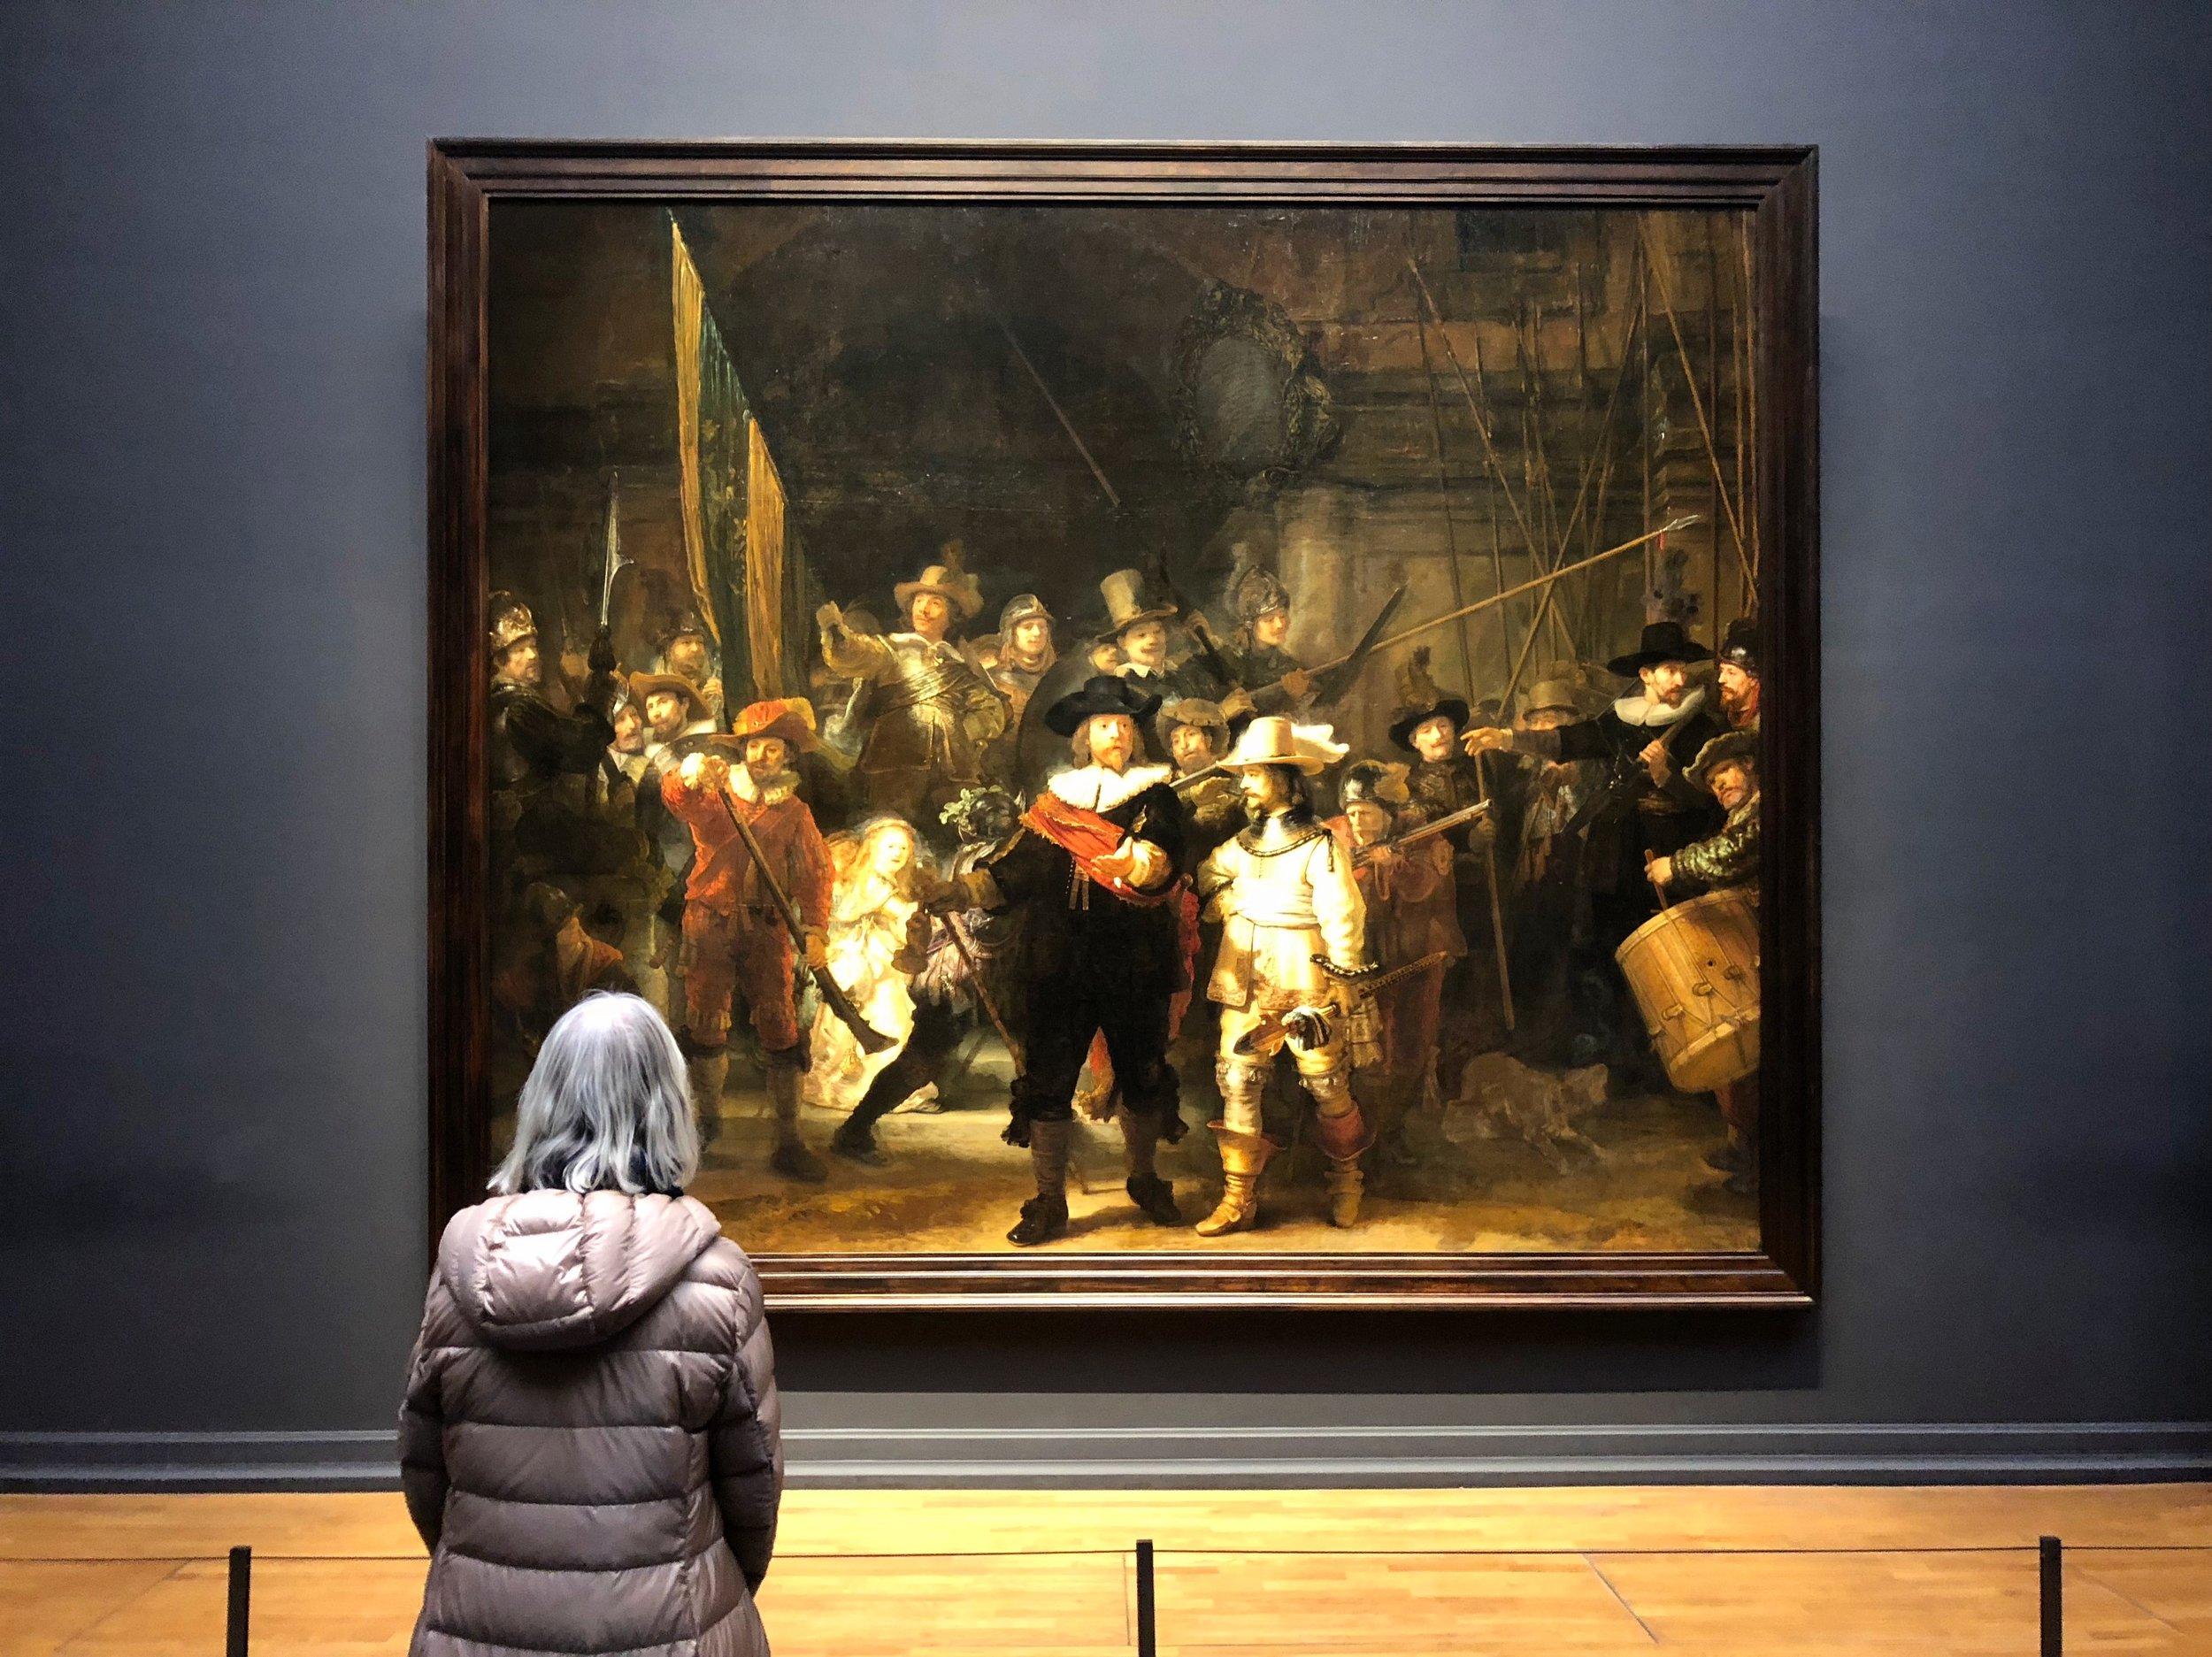 Rijksmuseum / Amsterdam / Netherlands